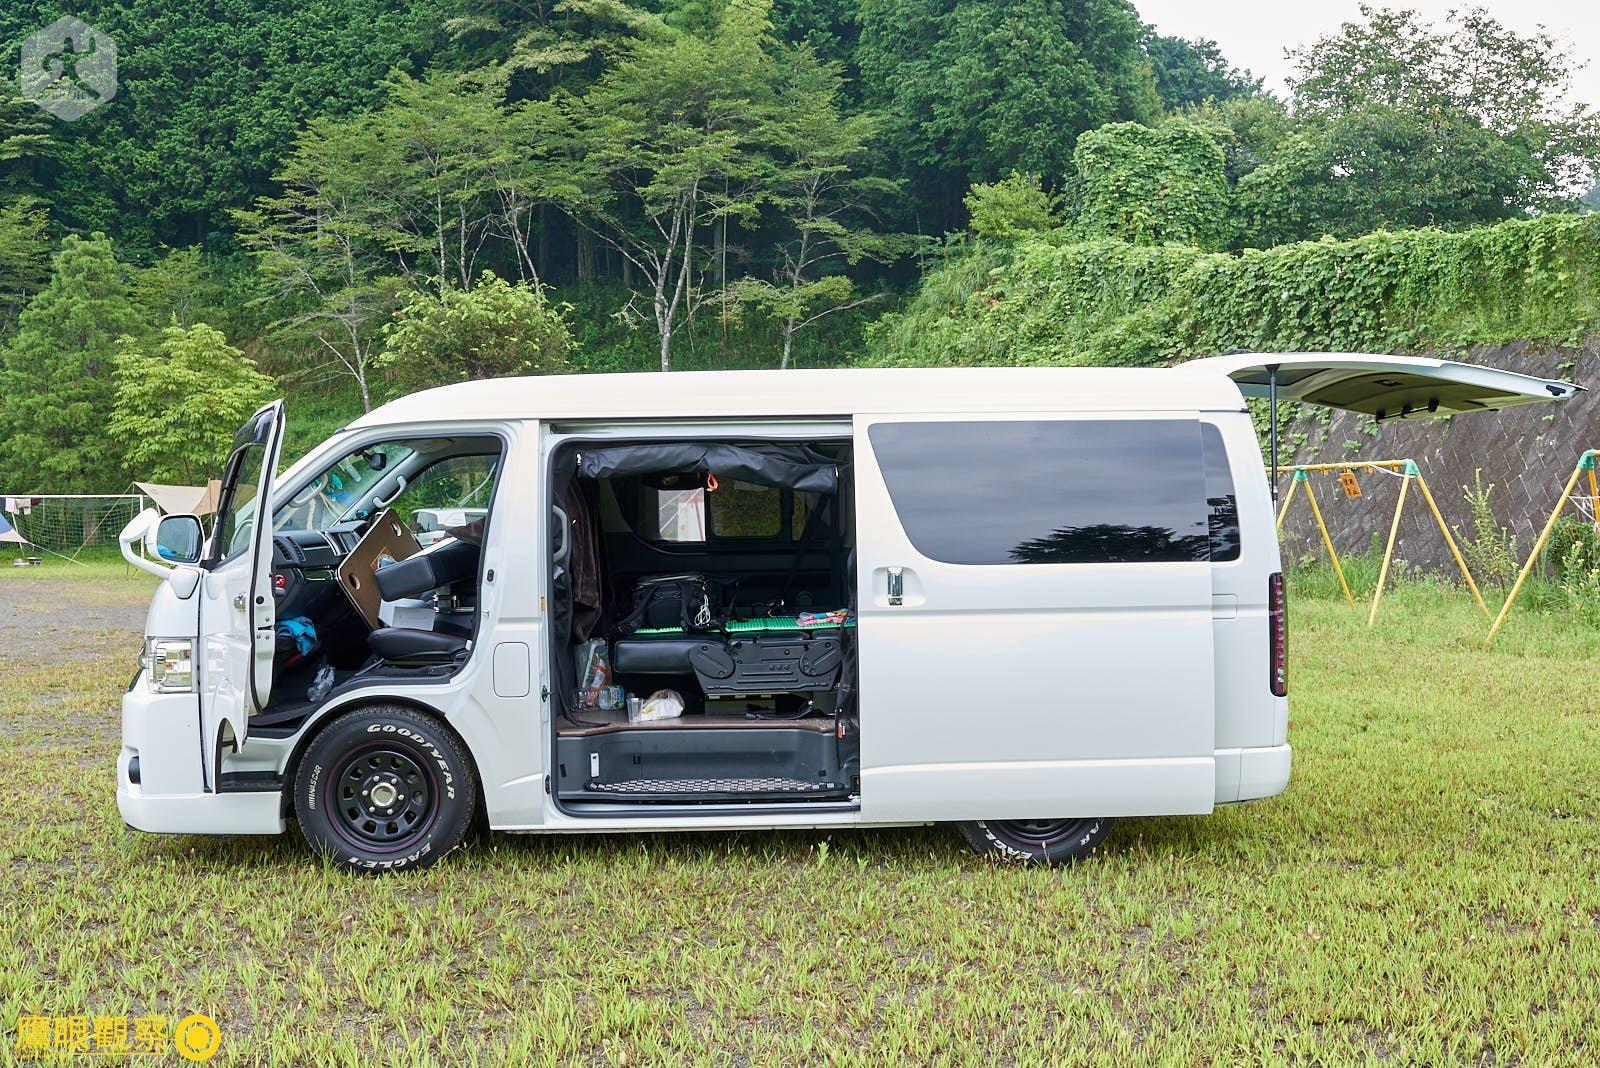 Japan Travel RV Camper toyota hiace 20190818053055 日本廢棄小學 🚗 RV 休旅車露營、森林探險之旅(櫪木縣鹿沼市立久我小學)🇯🇵⛺️